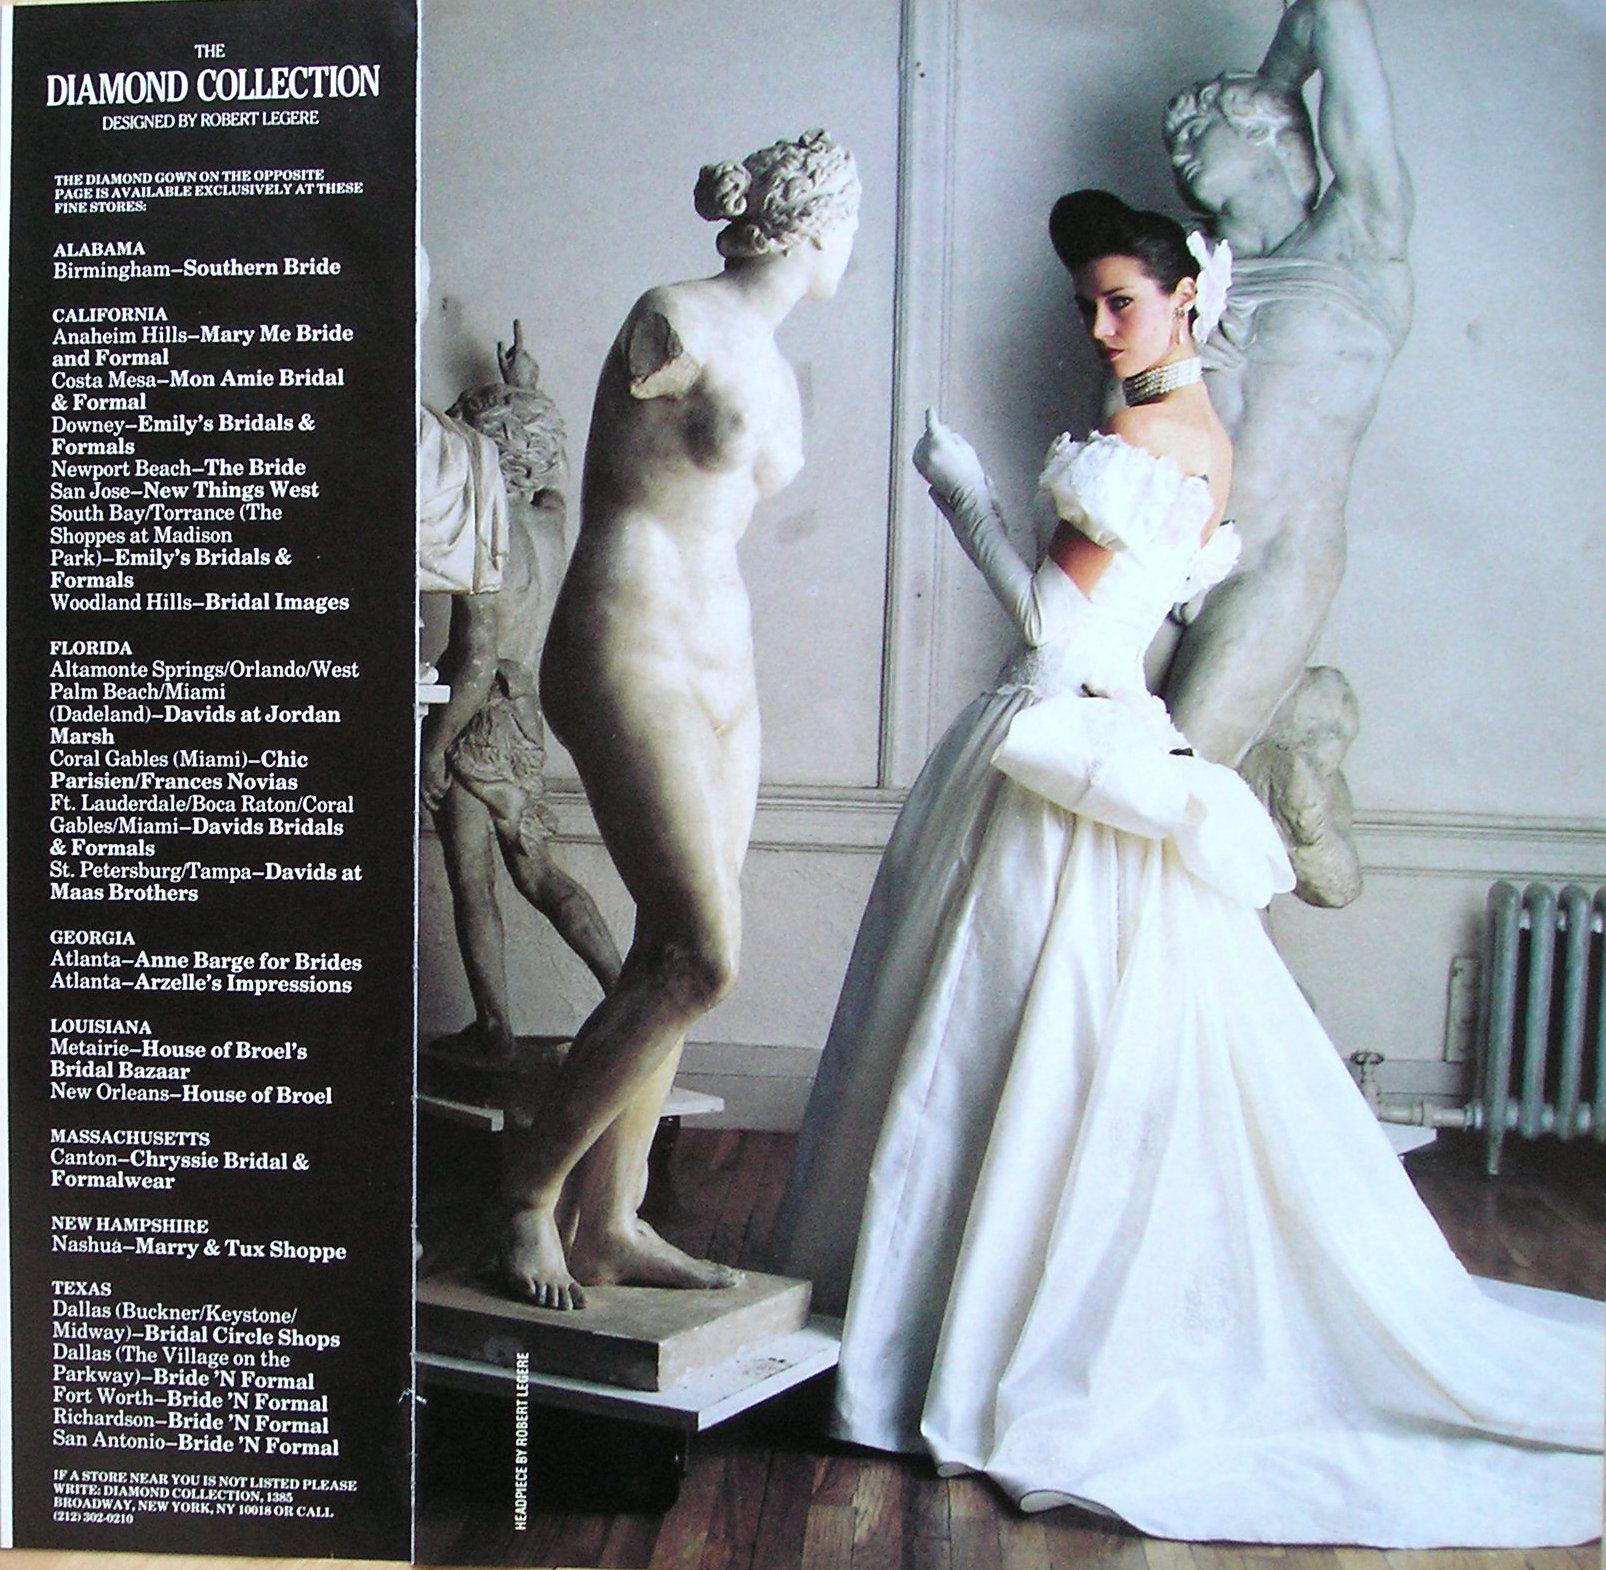 my wedding dress, 1987 Robert Legere for the Diamond